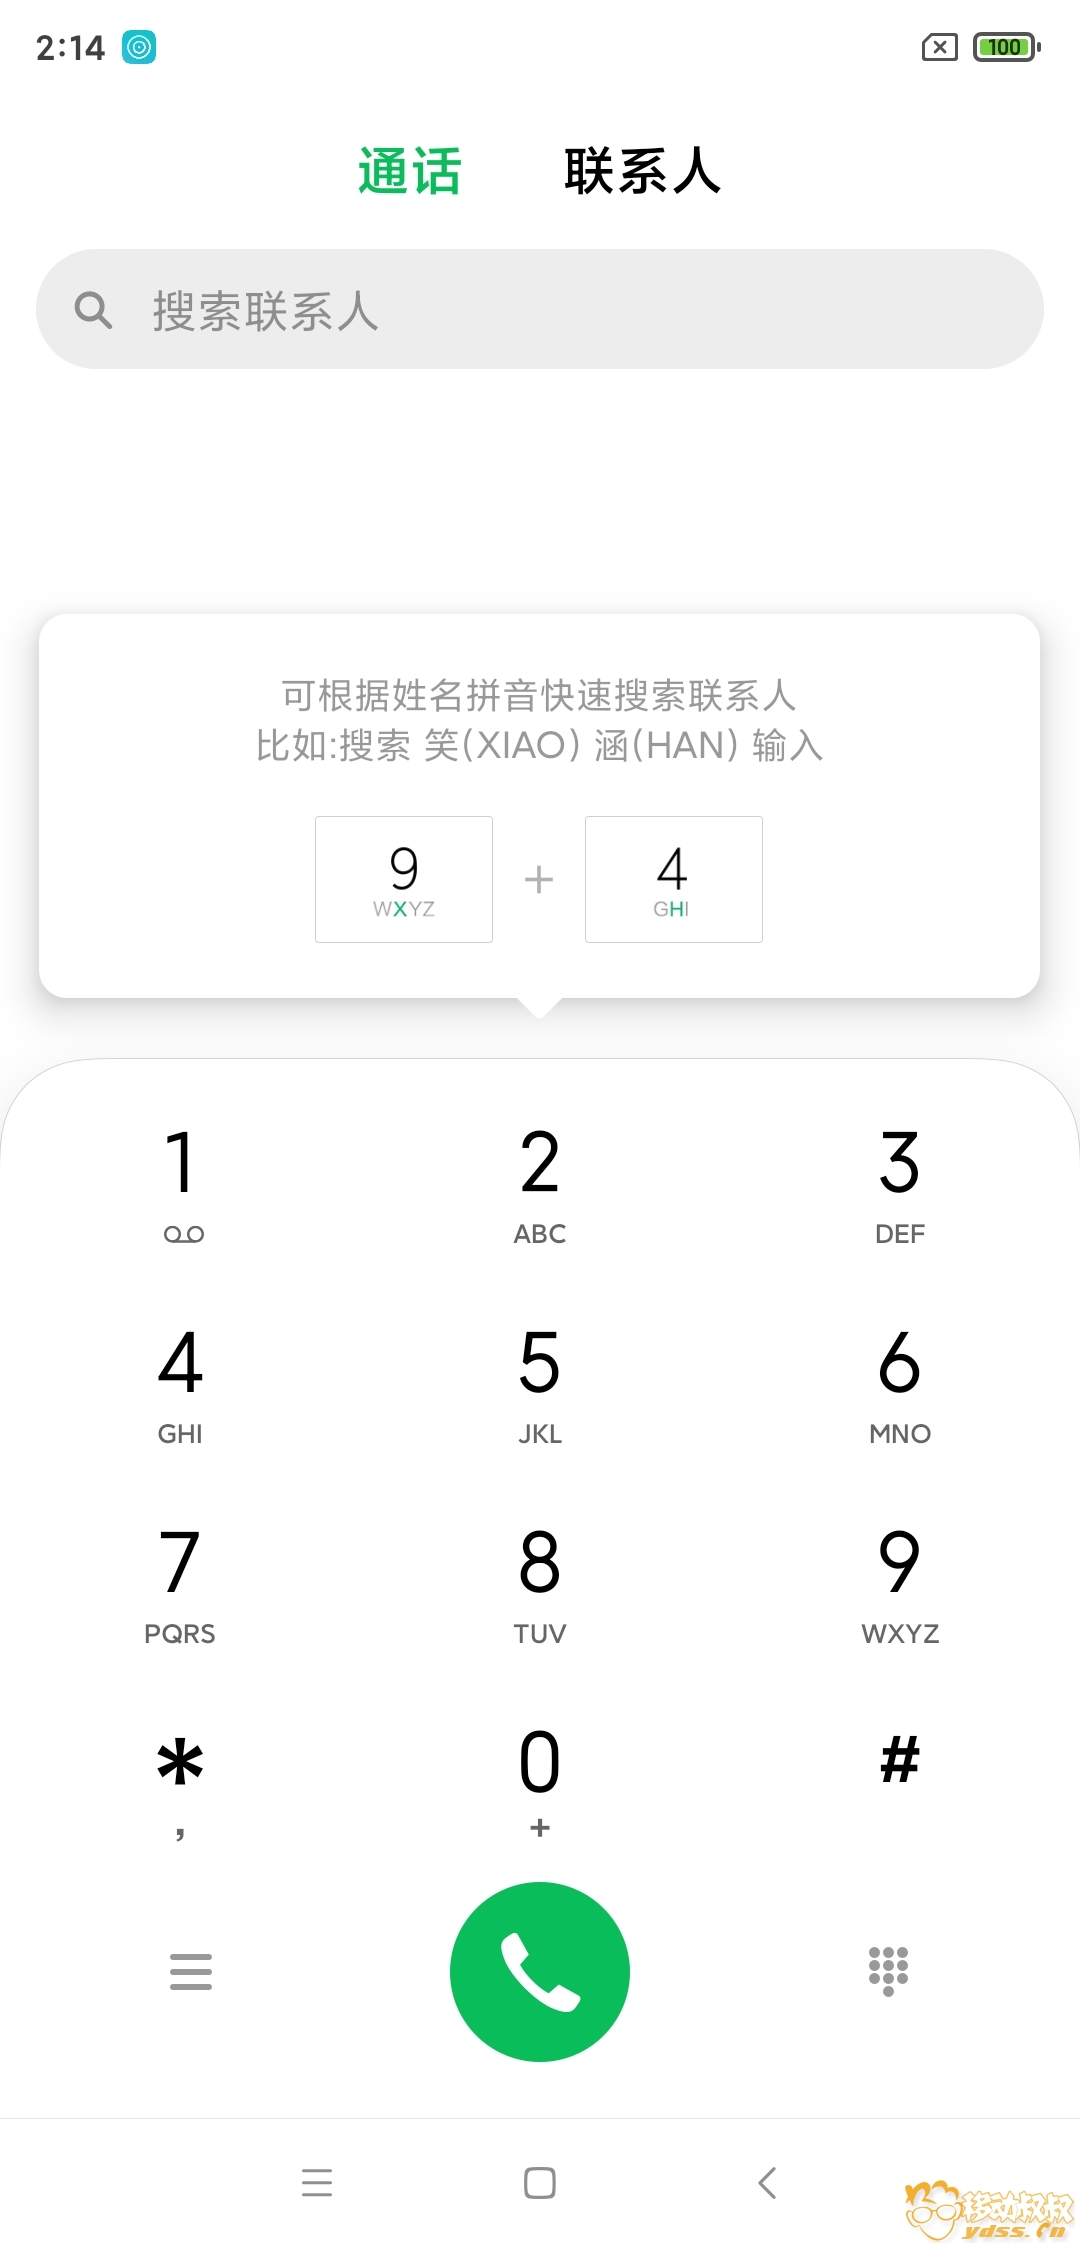 Screenshot_2020-03-26-02-14-39-184_com.android.contacts.jpg